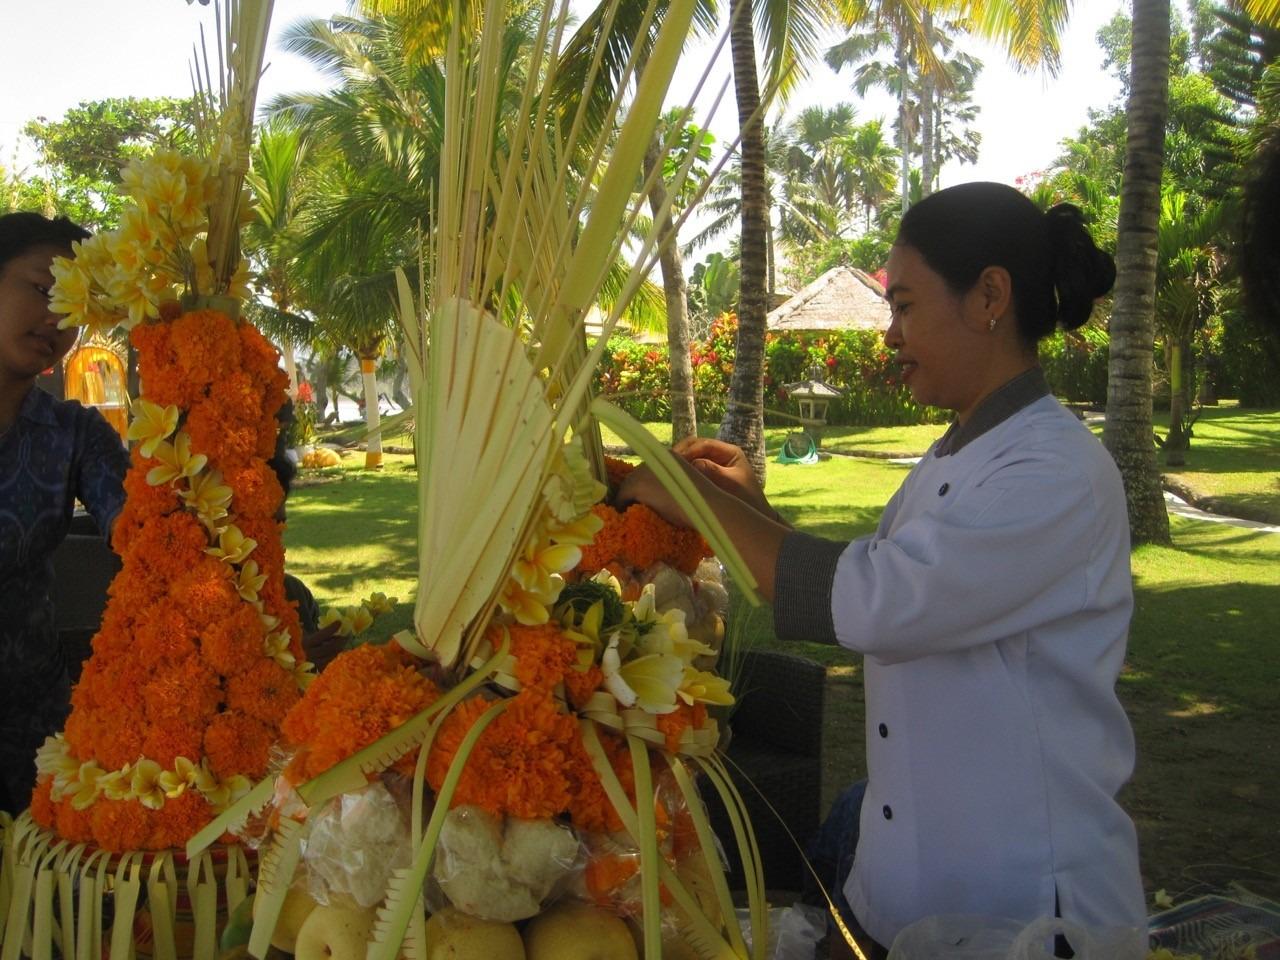 FLORAL DECORATIONS AT DAJUMA Puri Dajuma, Beach Eco-Resort & Spa, West Bali